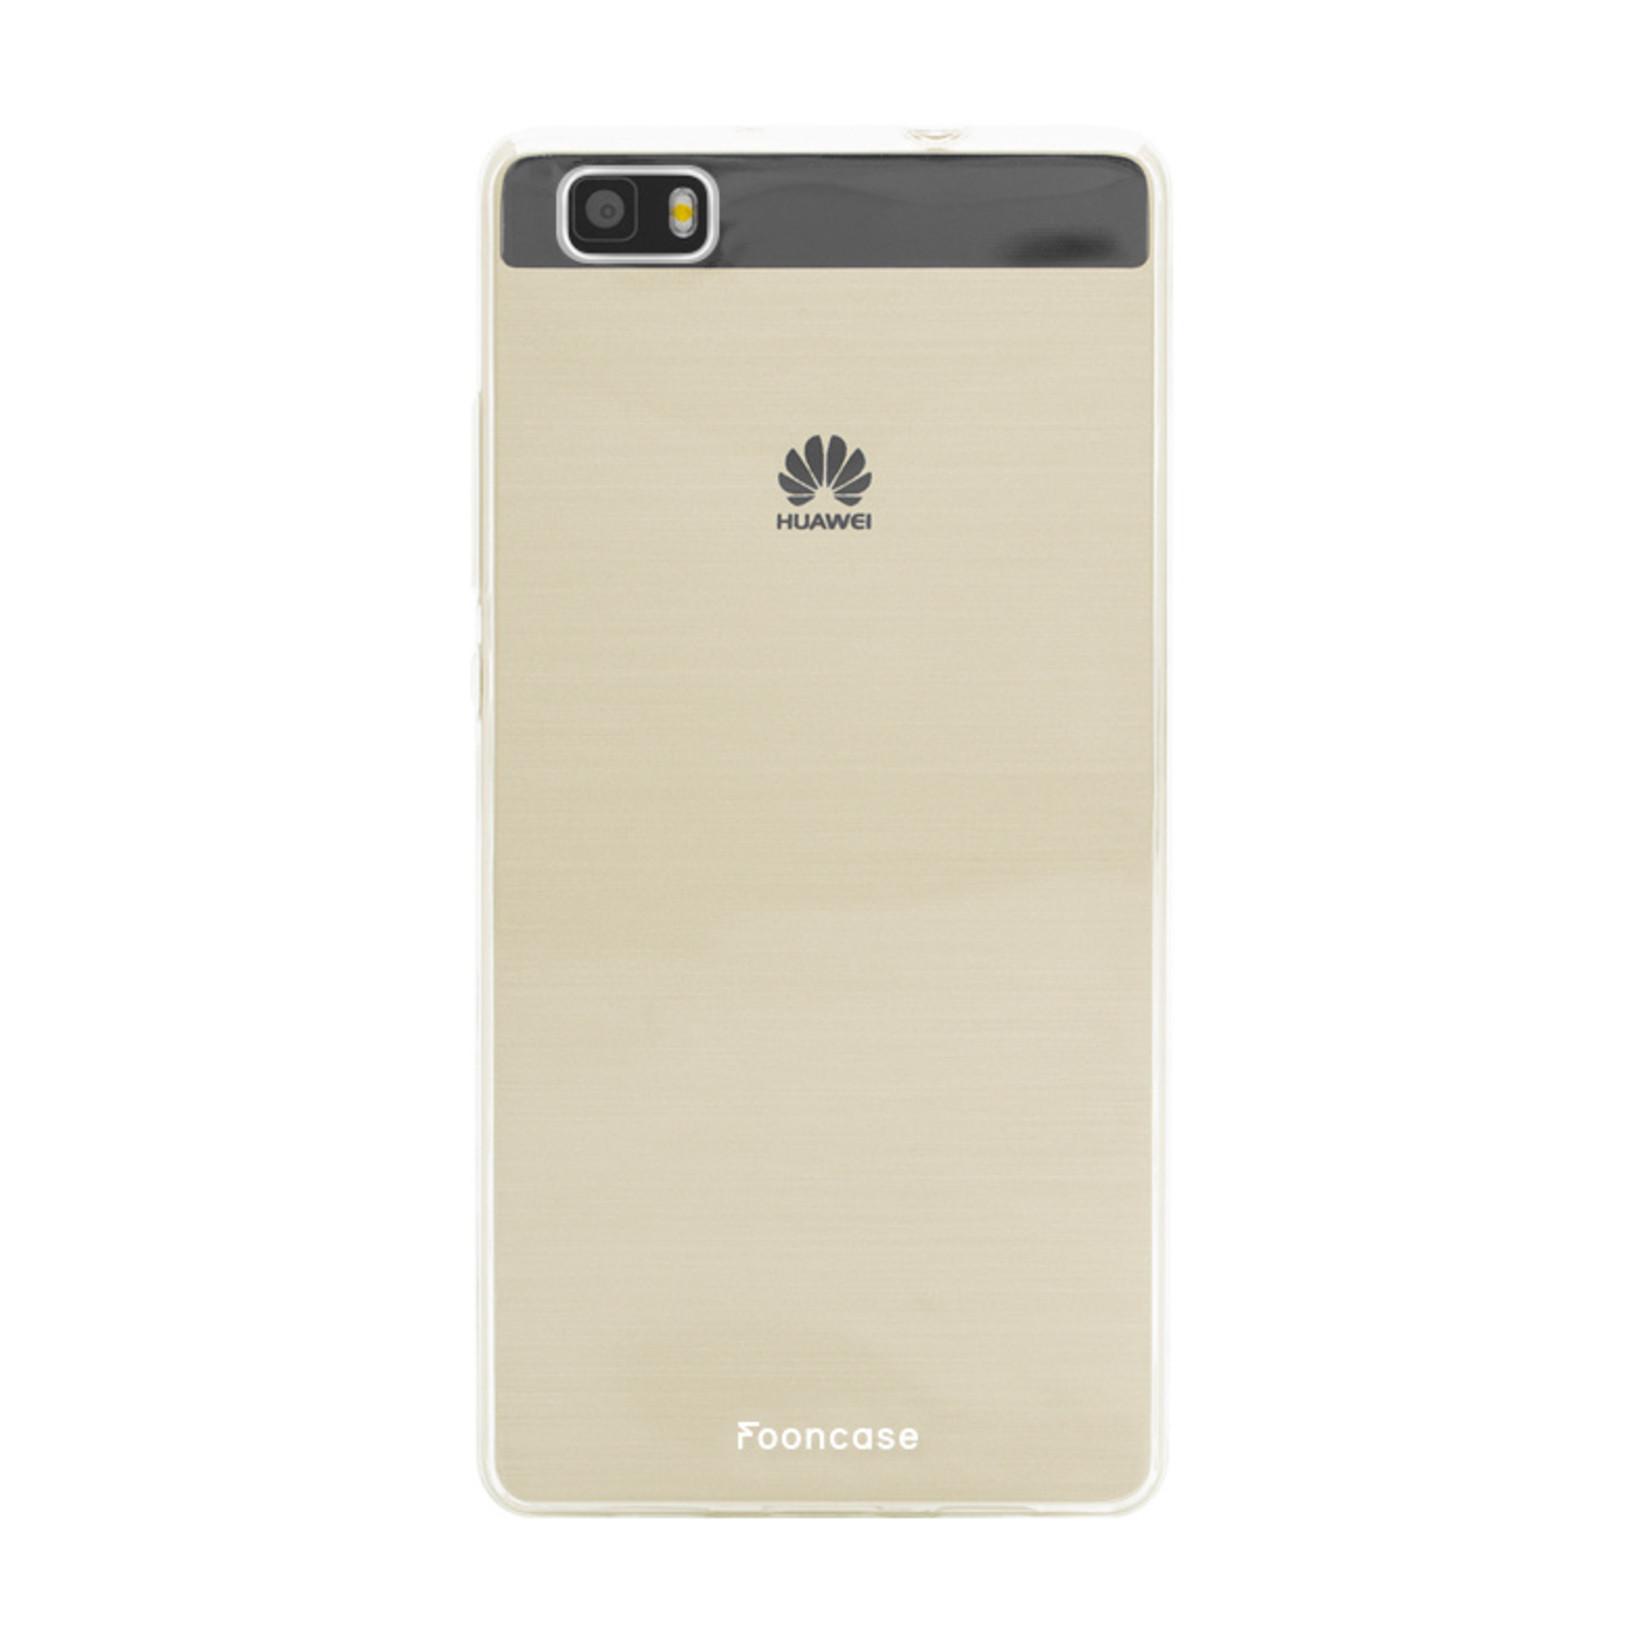 FOONCASE Huawei P8 Lite 2016 - Transparant